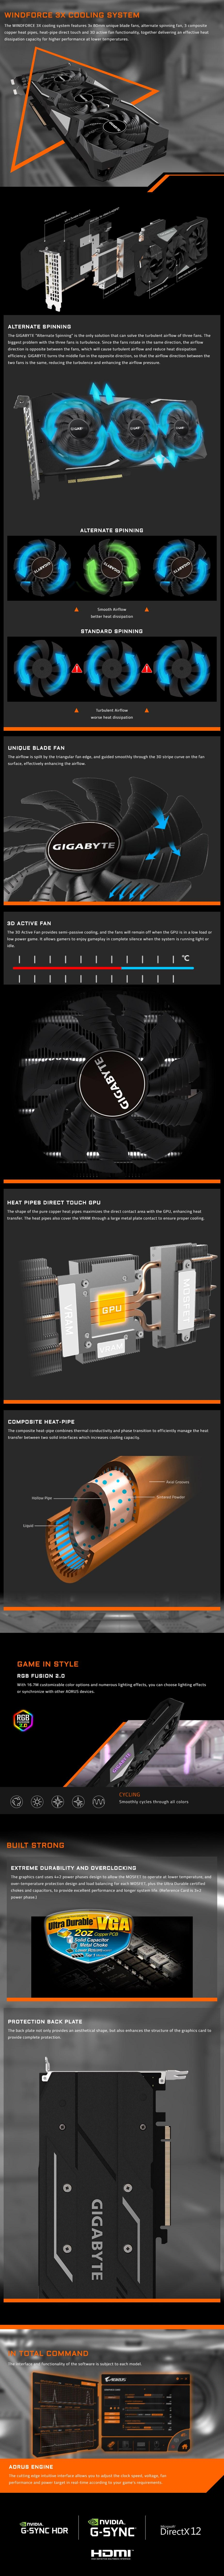 Gigabyte GeForce GTX 1660 SUPER GAMING OC 6GB Video Card - Overview 1